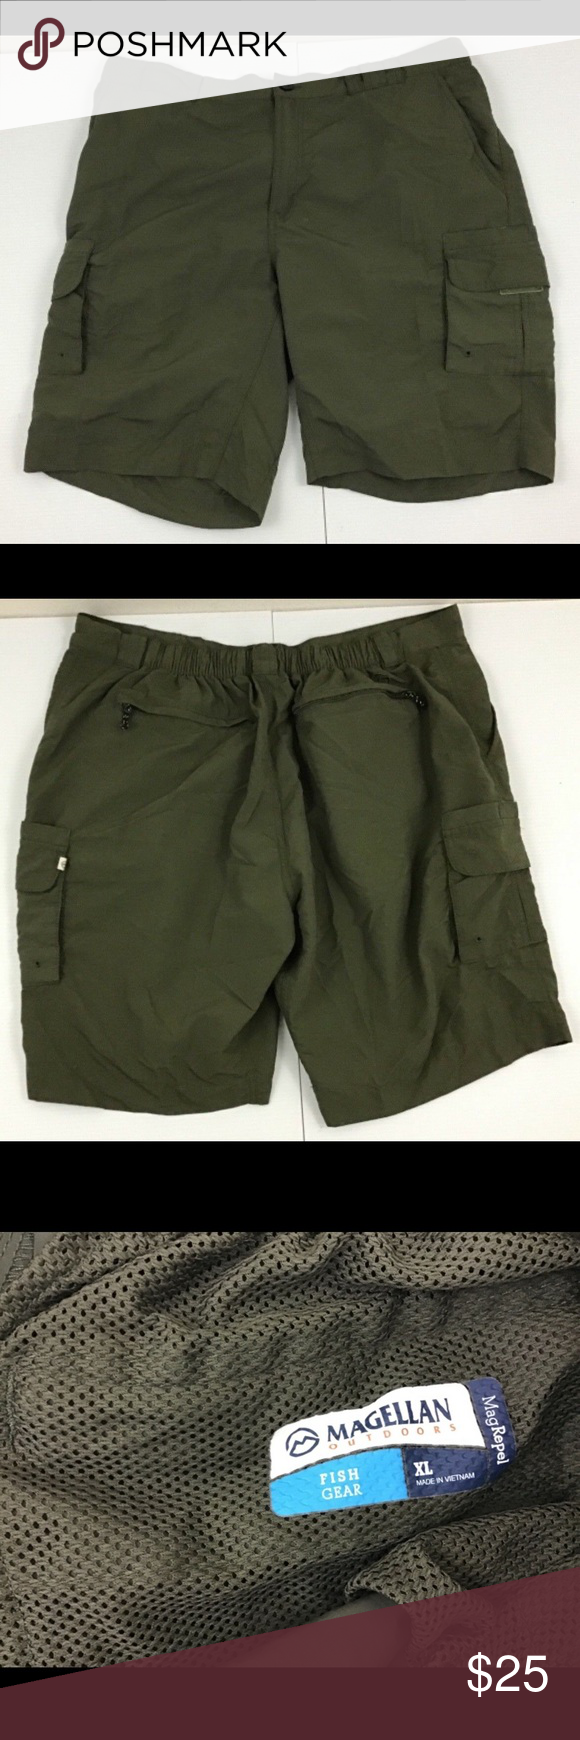 "2422756151 Magellan Fish Gear Mag Repel Cargo Shorts Size XL Magellan Fish Gear Mag  Repel Cargo Shorts Size XL Location W-27 17.5"" Across Waist 10.5"" Rise 9""  Inseam ..."